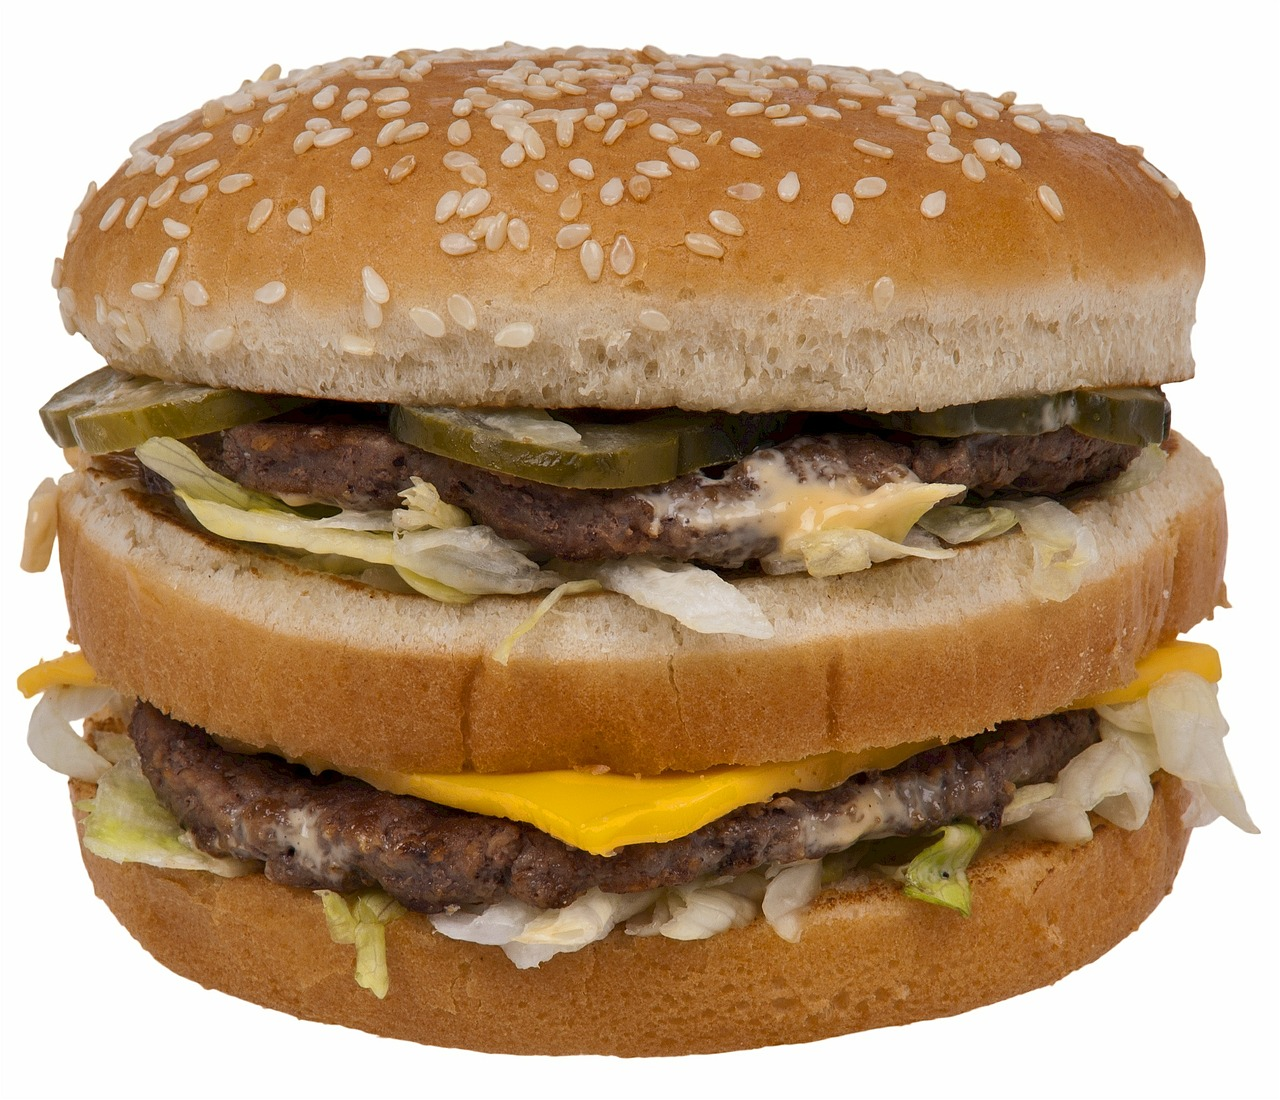 HOAX: Sperma auf McDonalds-Burger - Anti-Spam Info